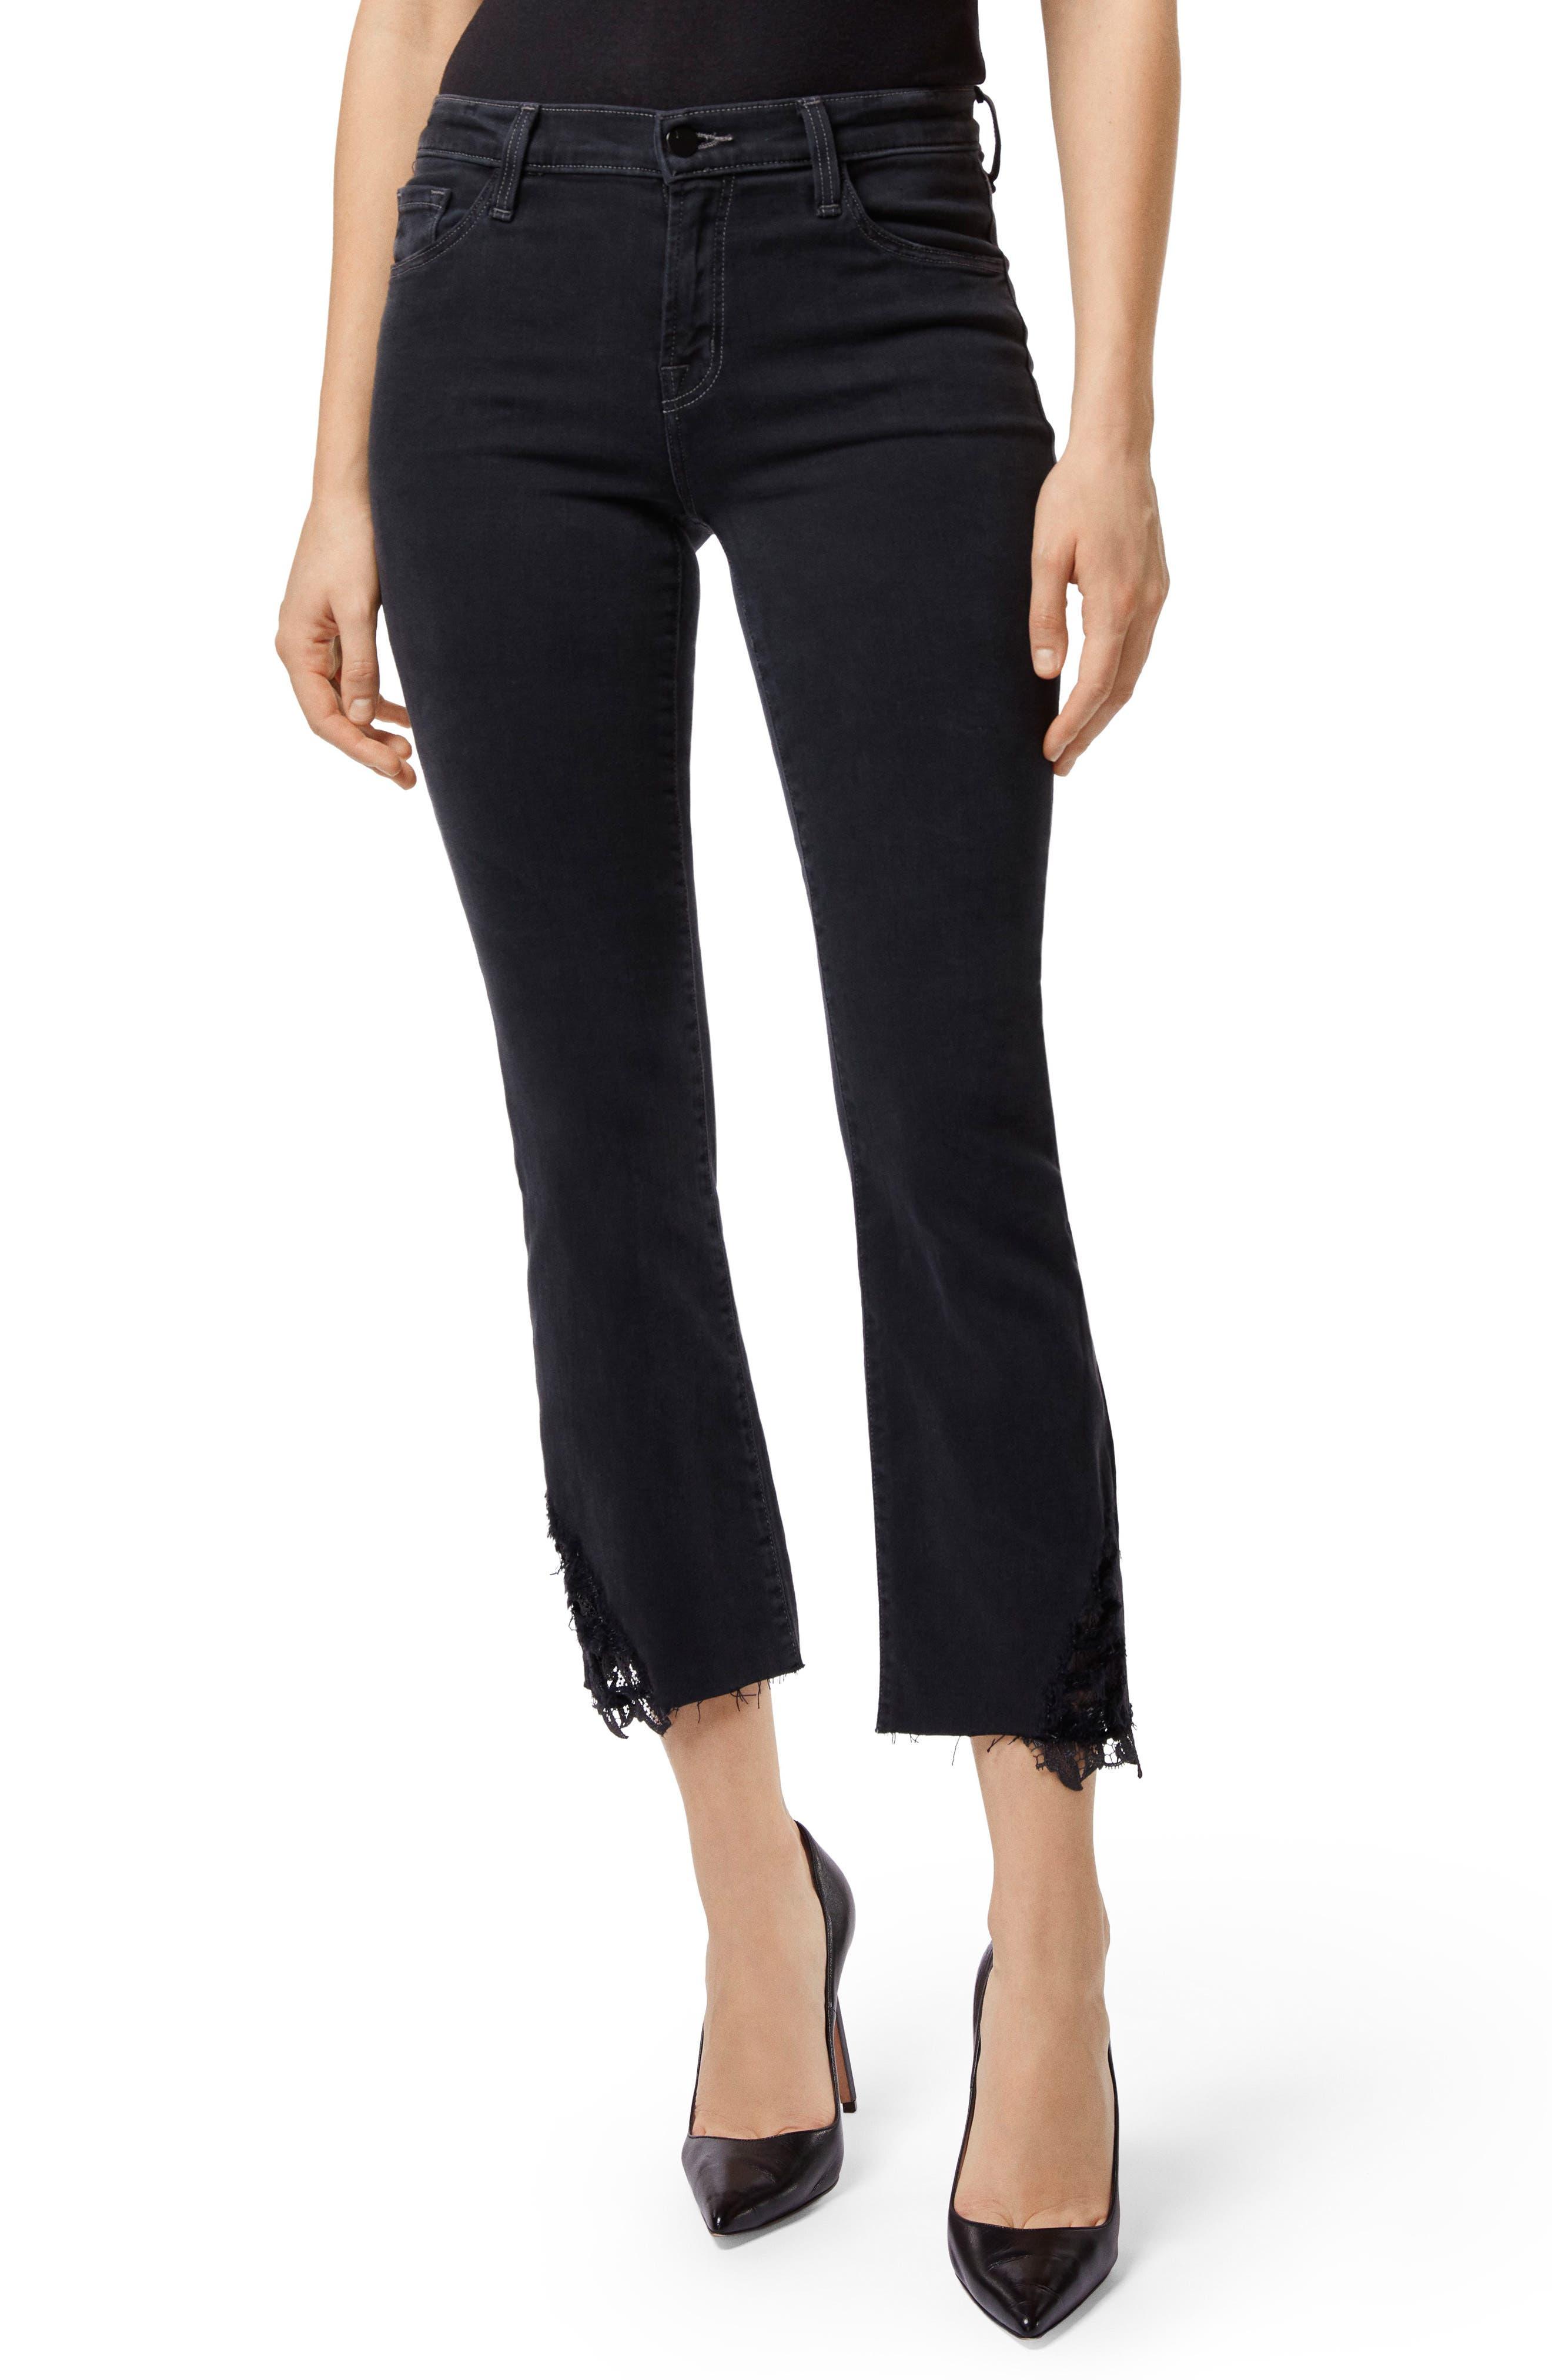 J BRAND Selena Crop Bootcut Jeans, Main, color, 001